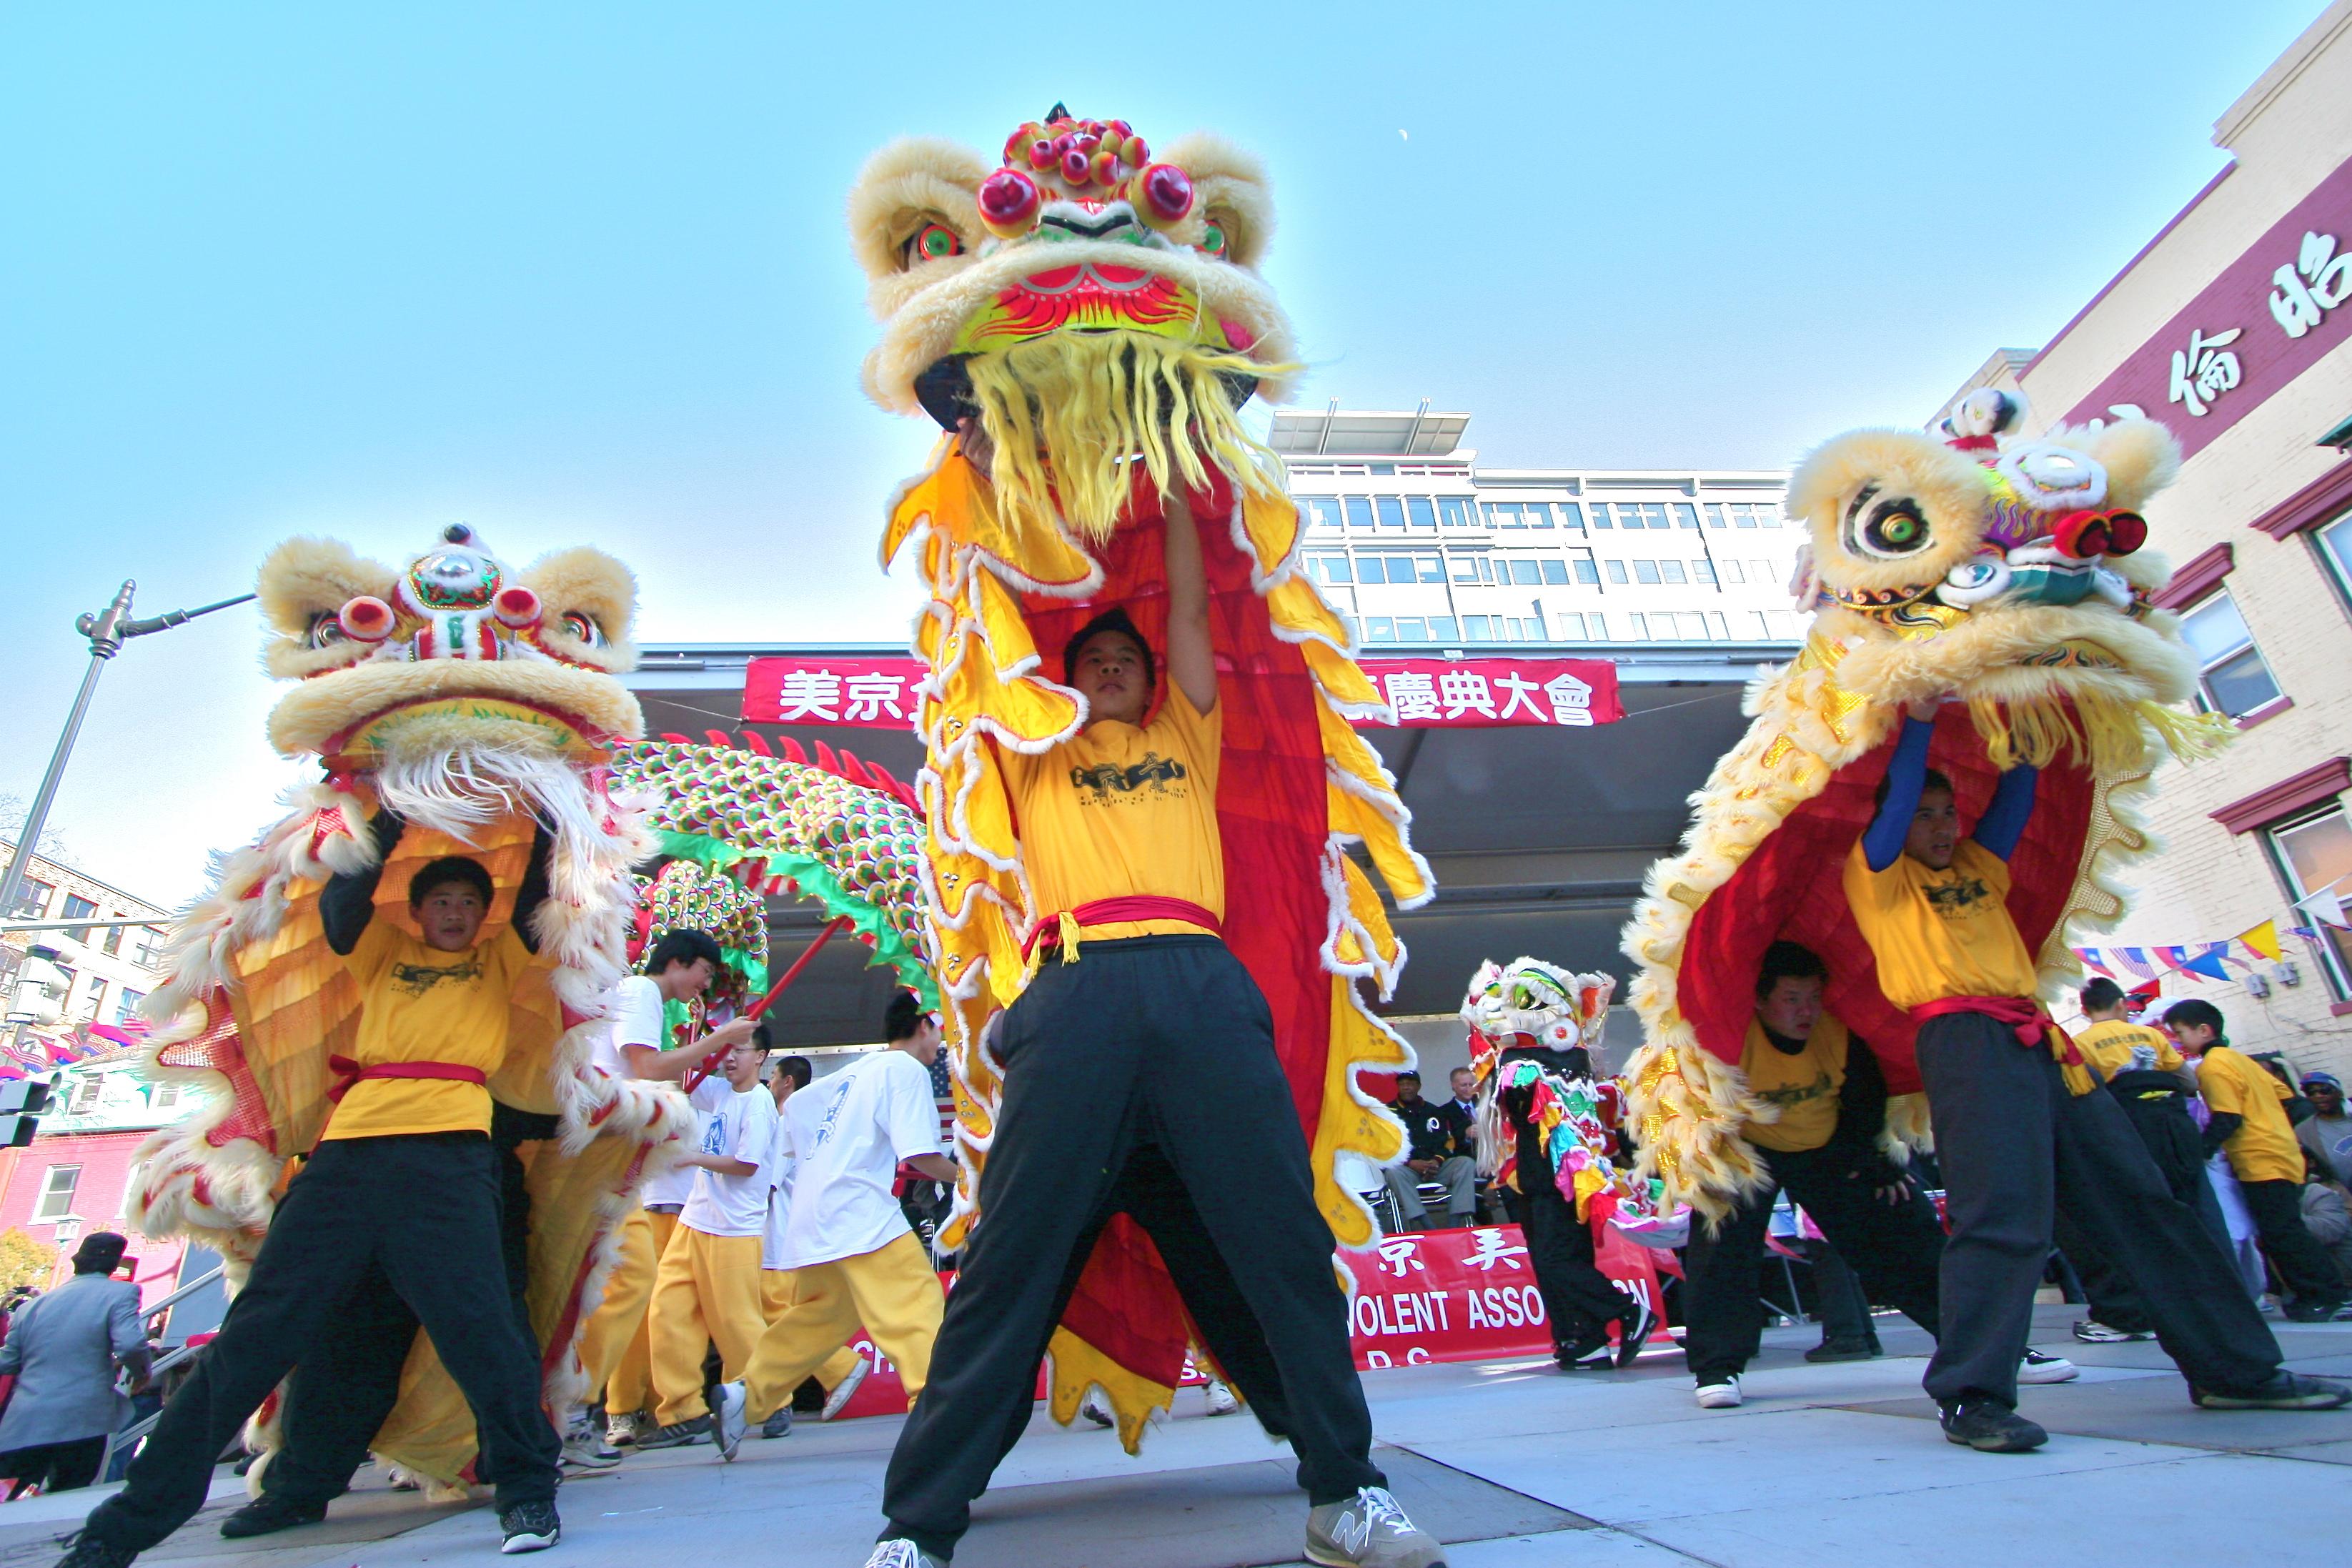 Chinese New Year 2020 Dc 2019 DC Chinese New Year Parade in Chinatown, Washington DC